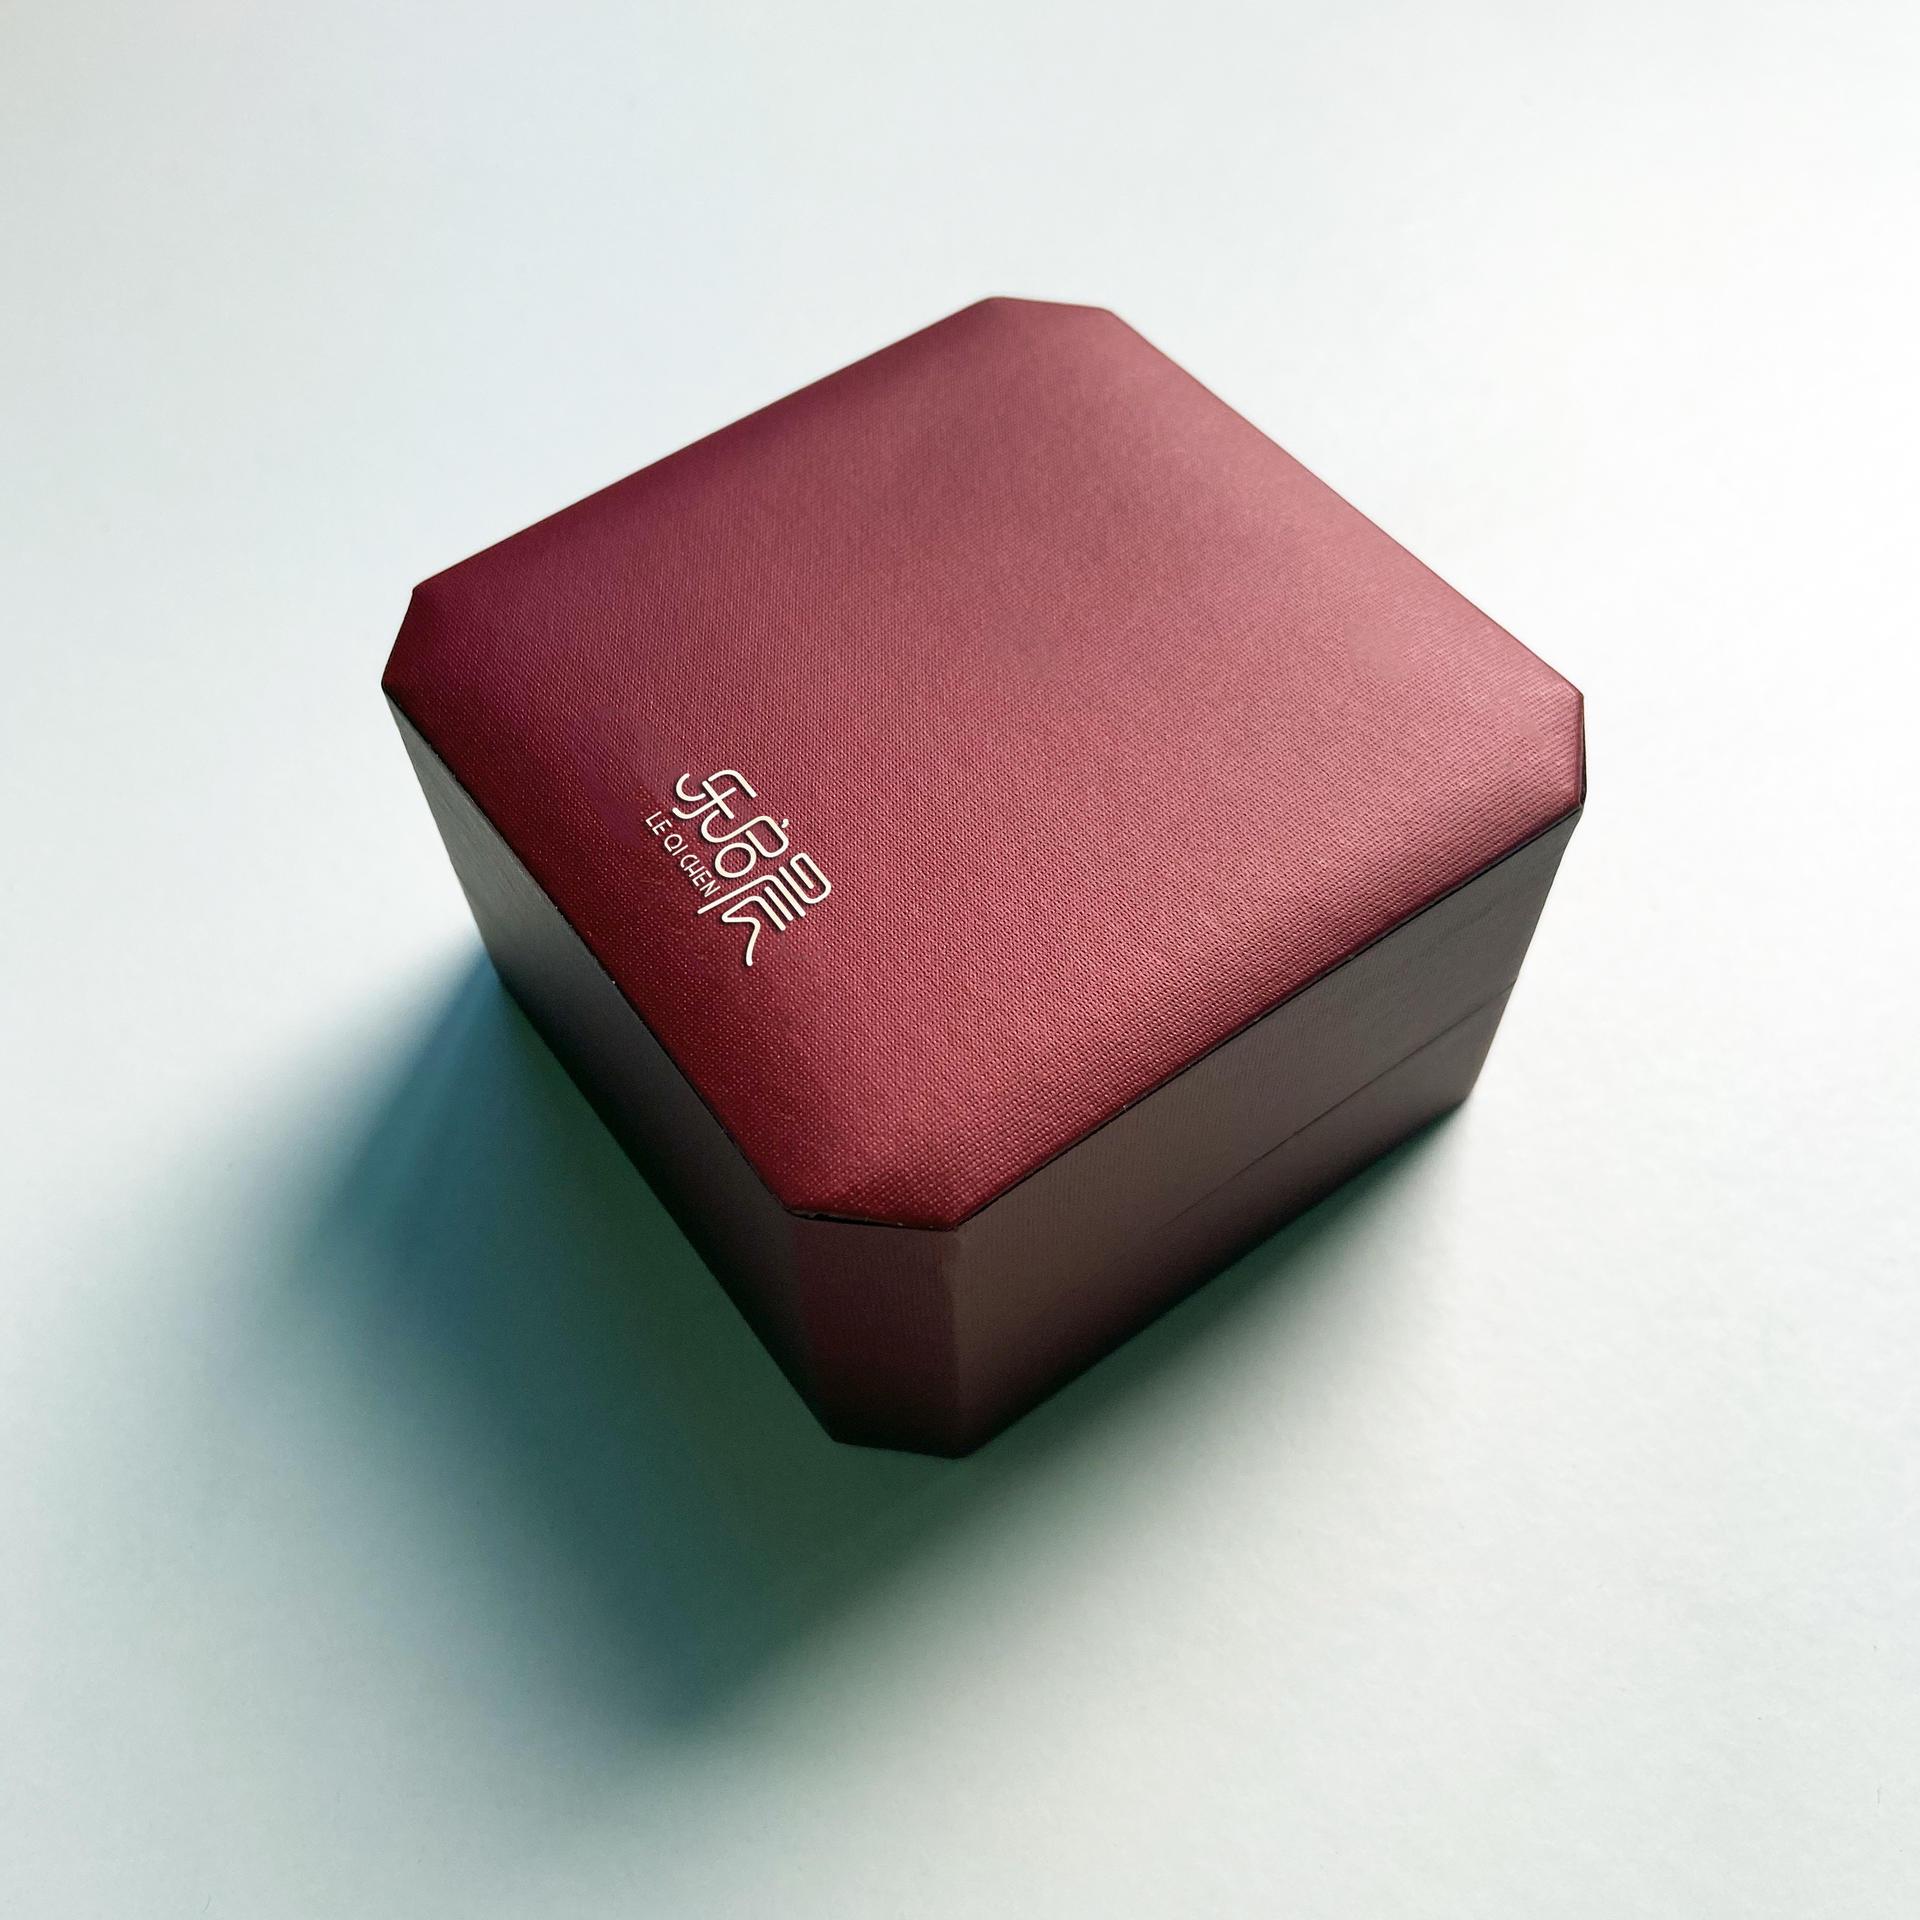 Handmade Recycle Packing, Jewelry Box,custom Drawer Box With Custom Logo